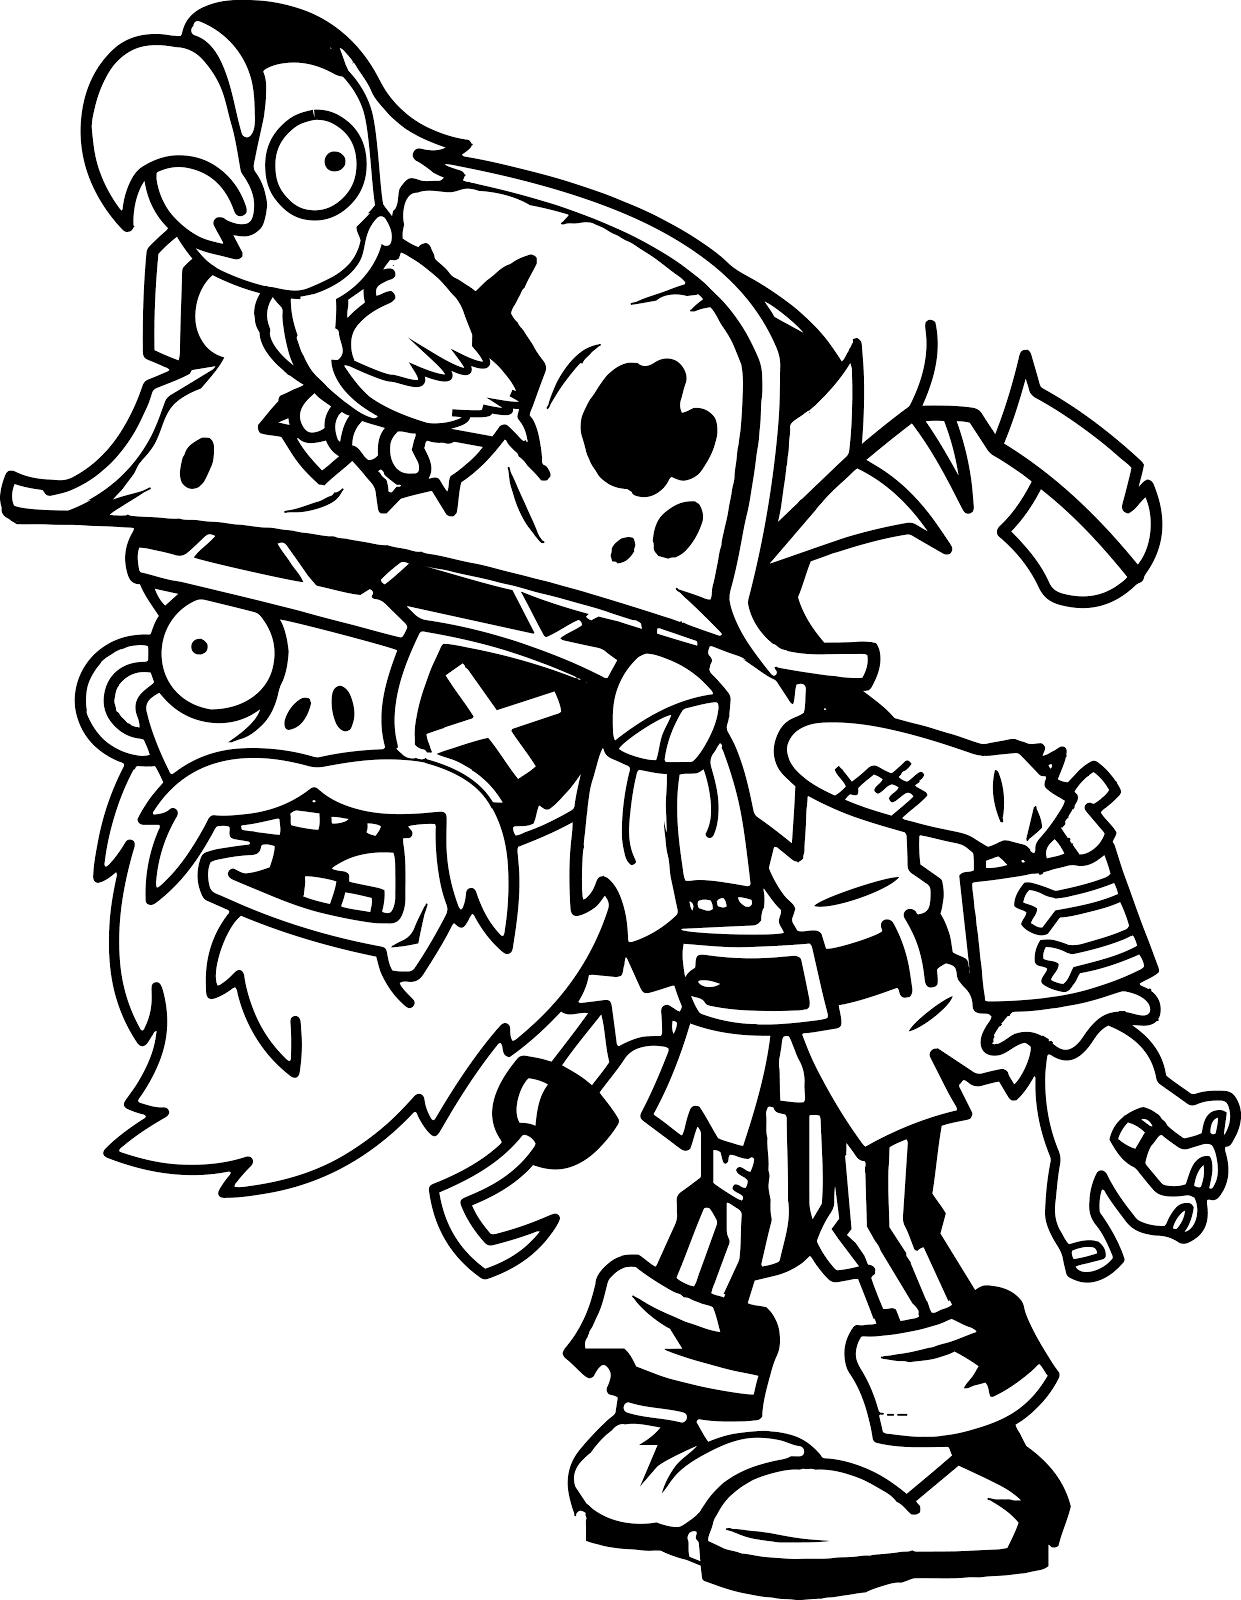 Desenho De Cereja Bomba De Plants Vs Zombies Para Colorir